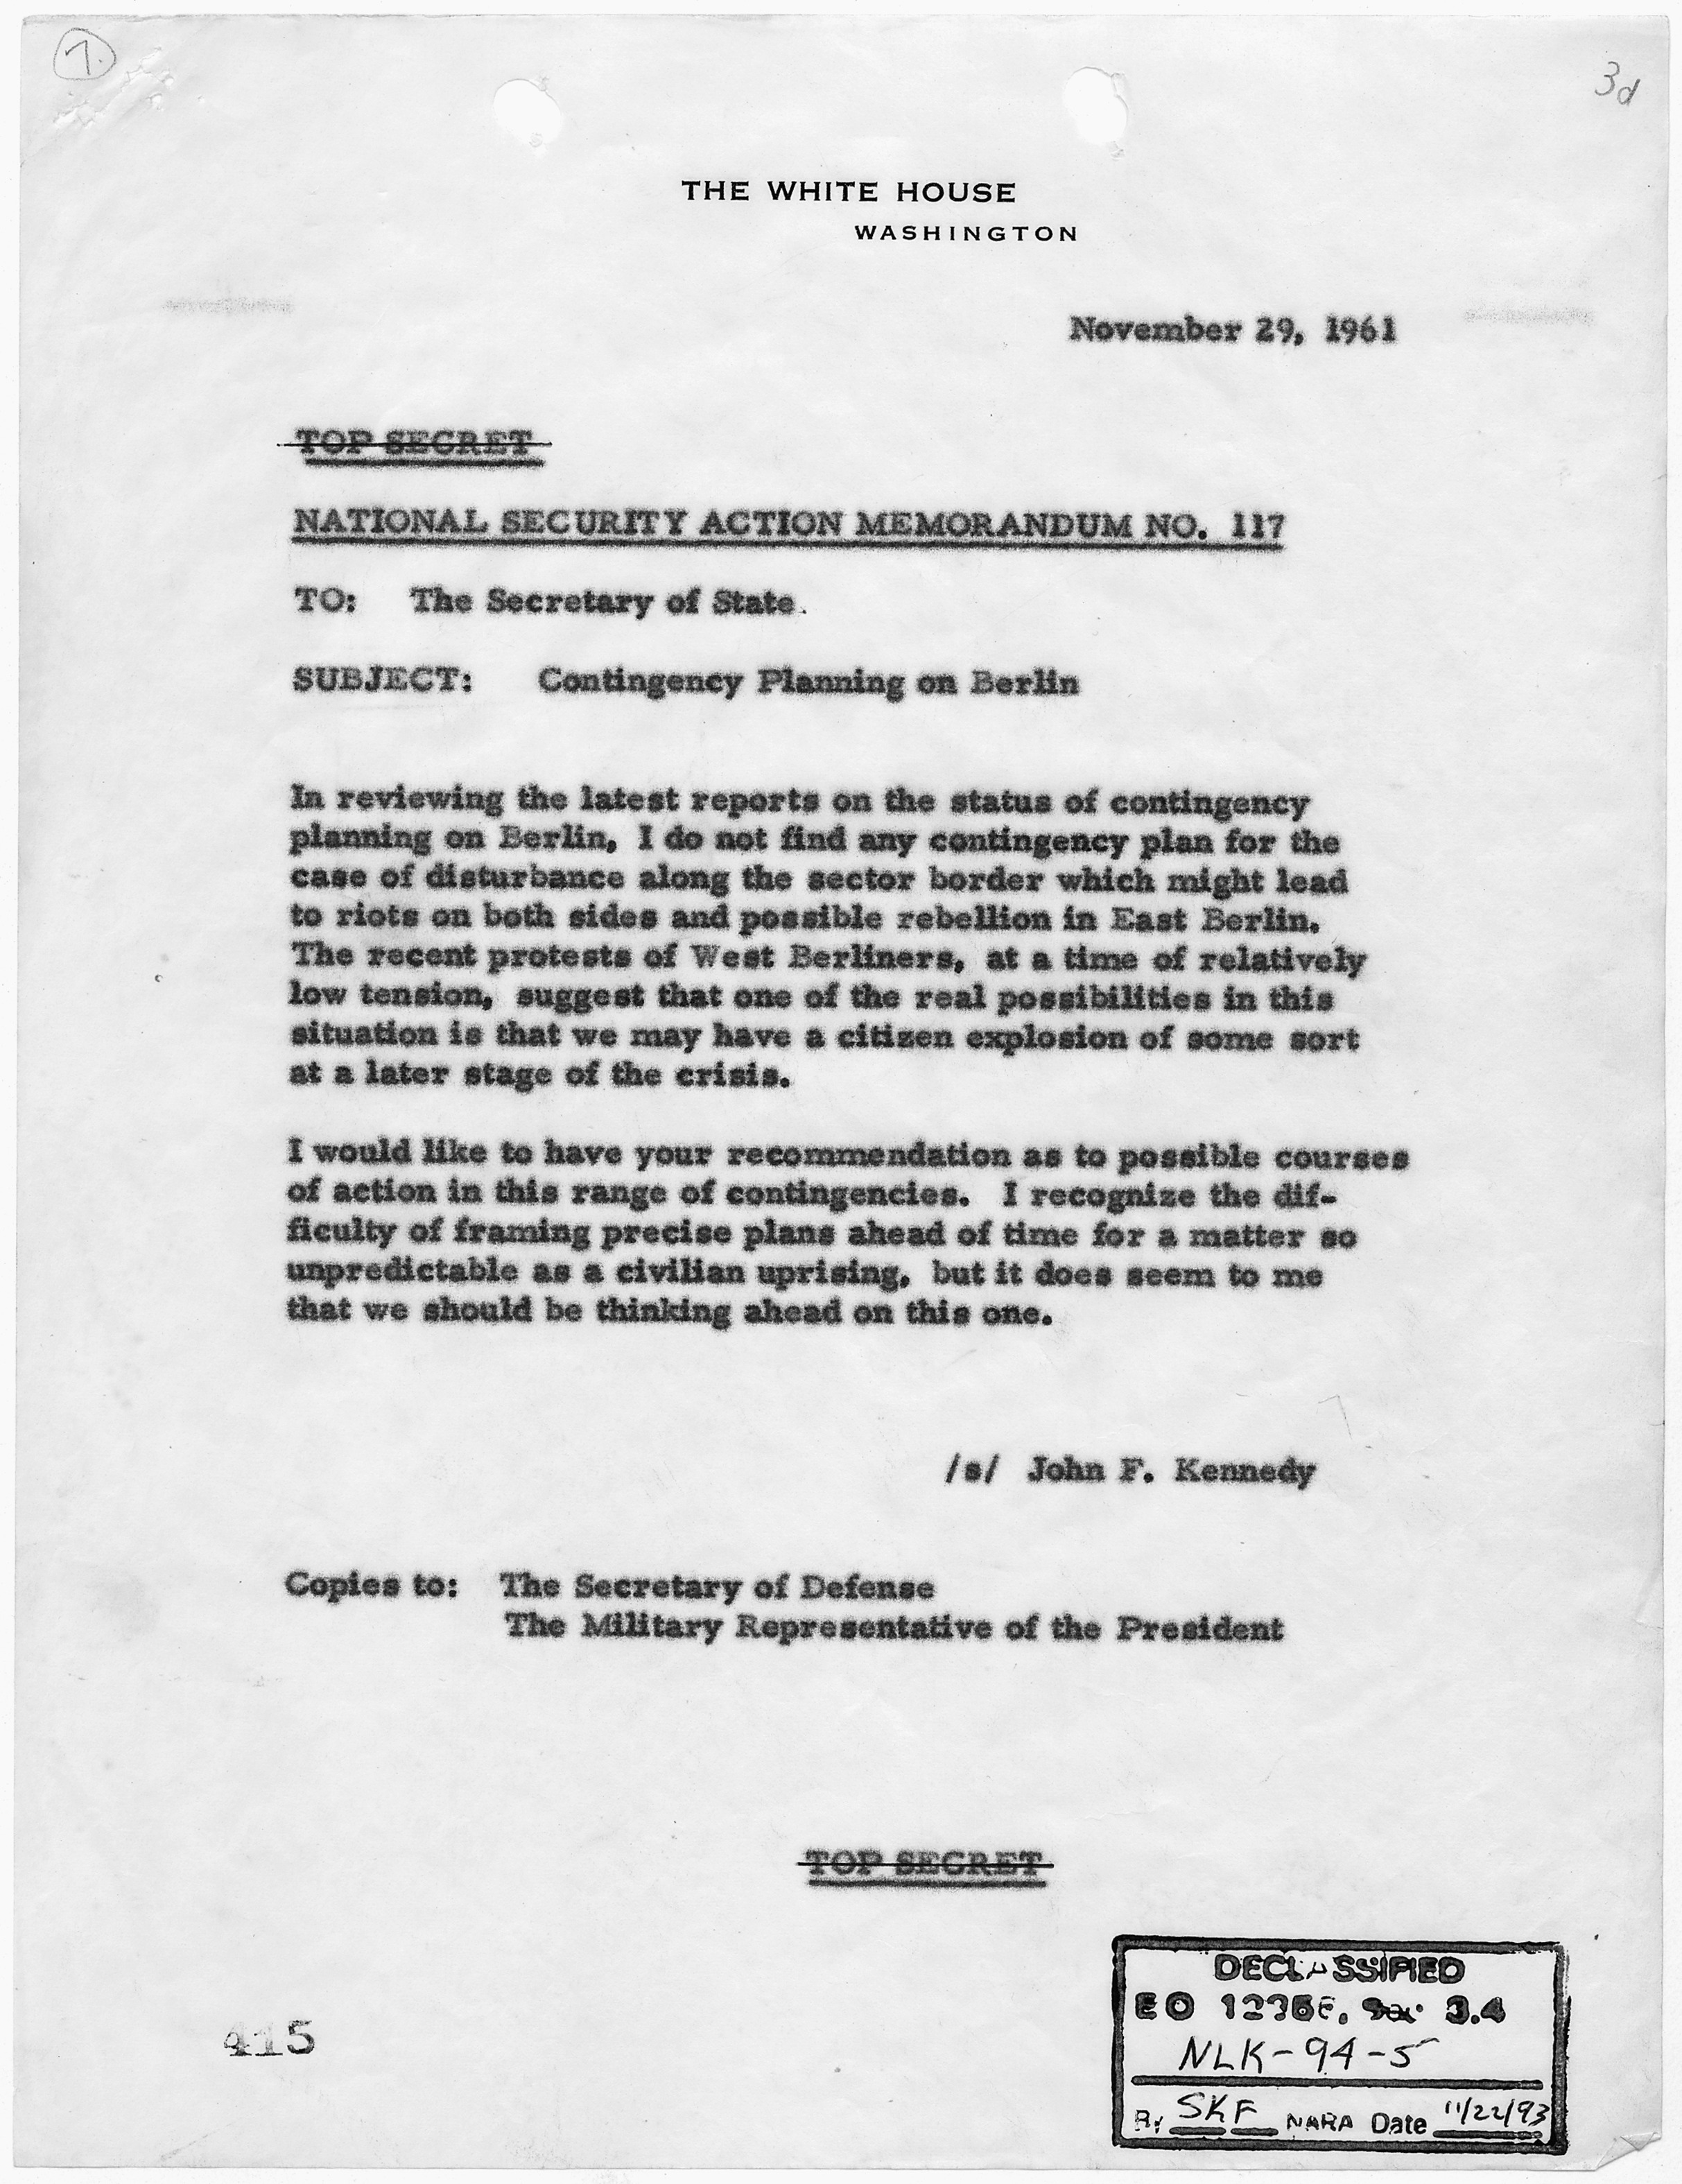 John Fitzgerald Kennedy David Cobb The Speeches Of John Fitzgerald Kennedy The 35th President Of The